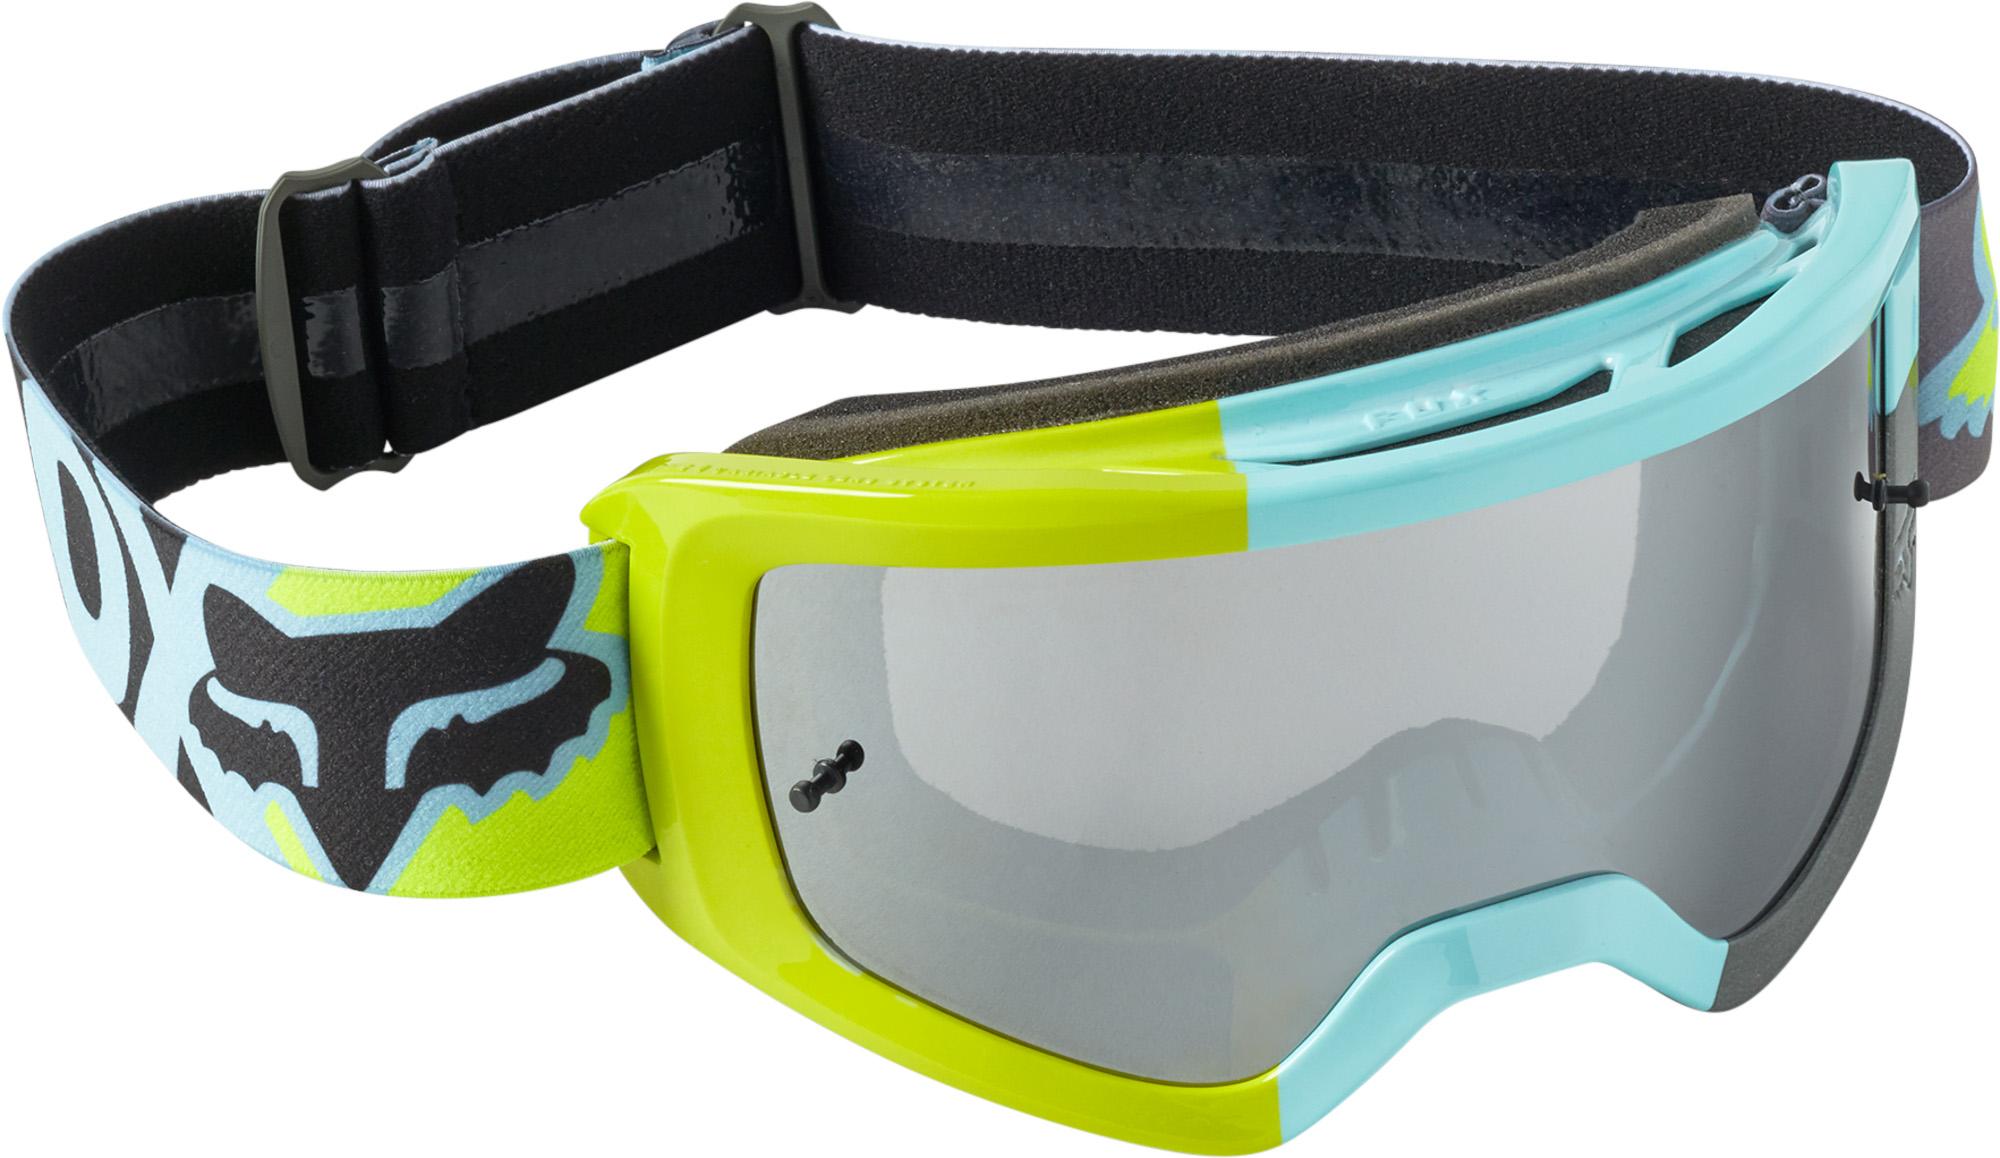 FOX Yth Main Trice Goggle - OS, Teal MX22